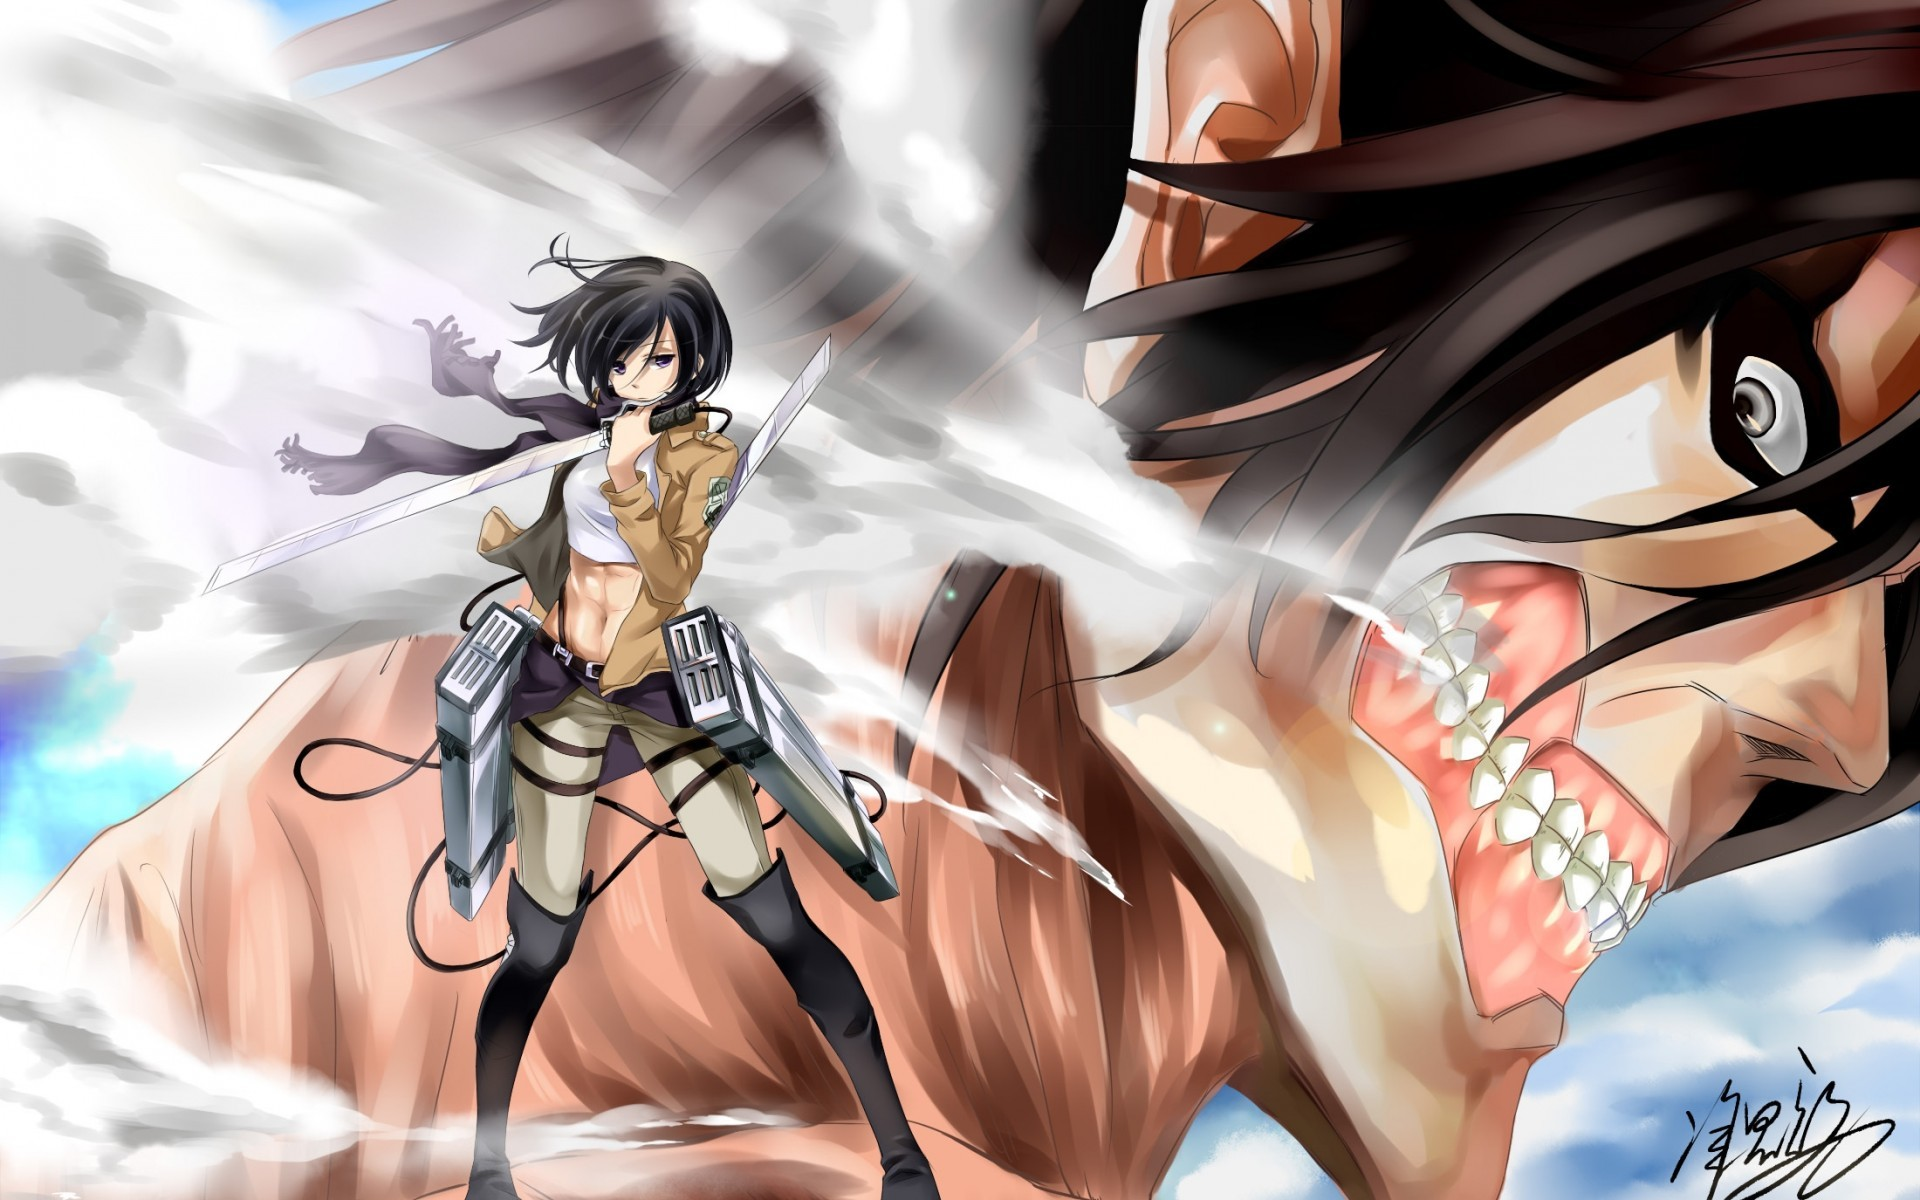 Attack On Titan Mikasa And Eren Wallpaper Attack On Titan Mikasa Ackerman Wallpapers 82 Images Hd Wallpaper Anime Attack On Titan Eren Yeager Mikasa Ackerman Shingeki No Kyojin Armin Arlert 4k